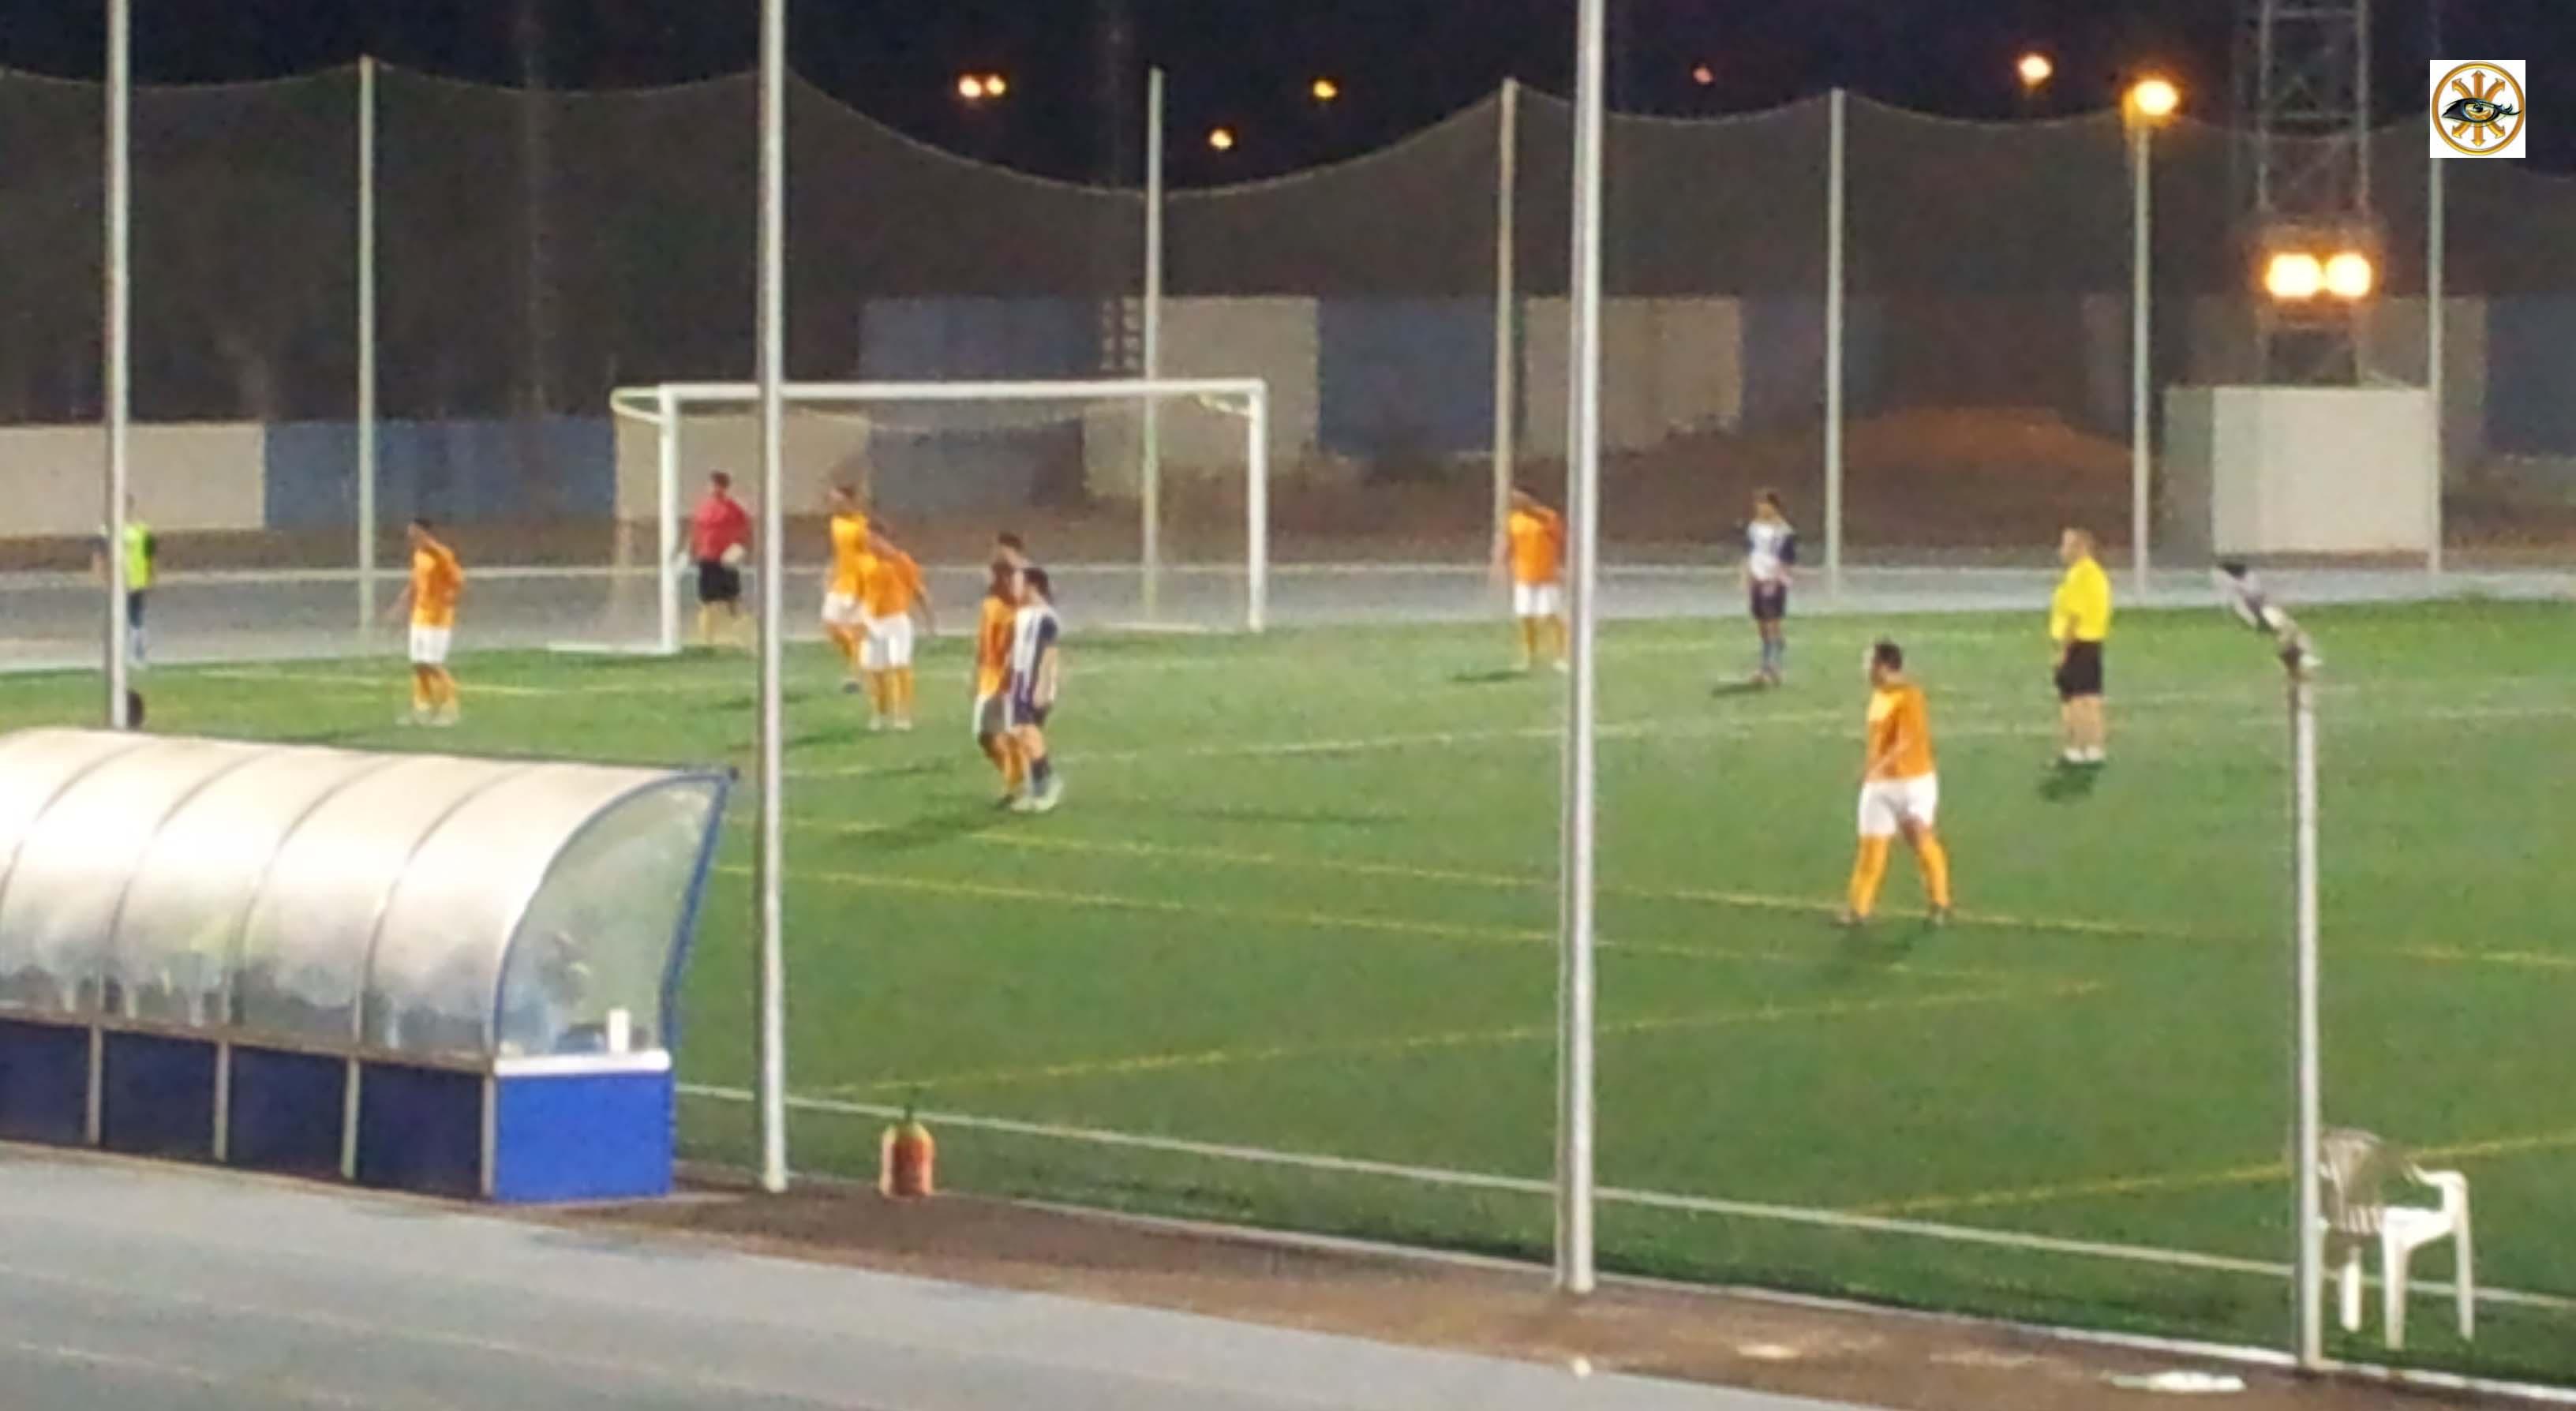 Pretemporada : San Juan 2 - Alicante 2